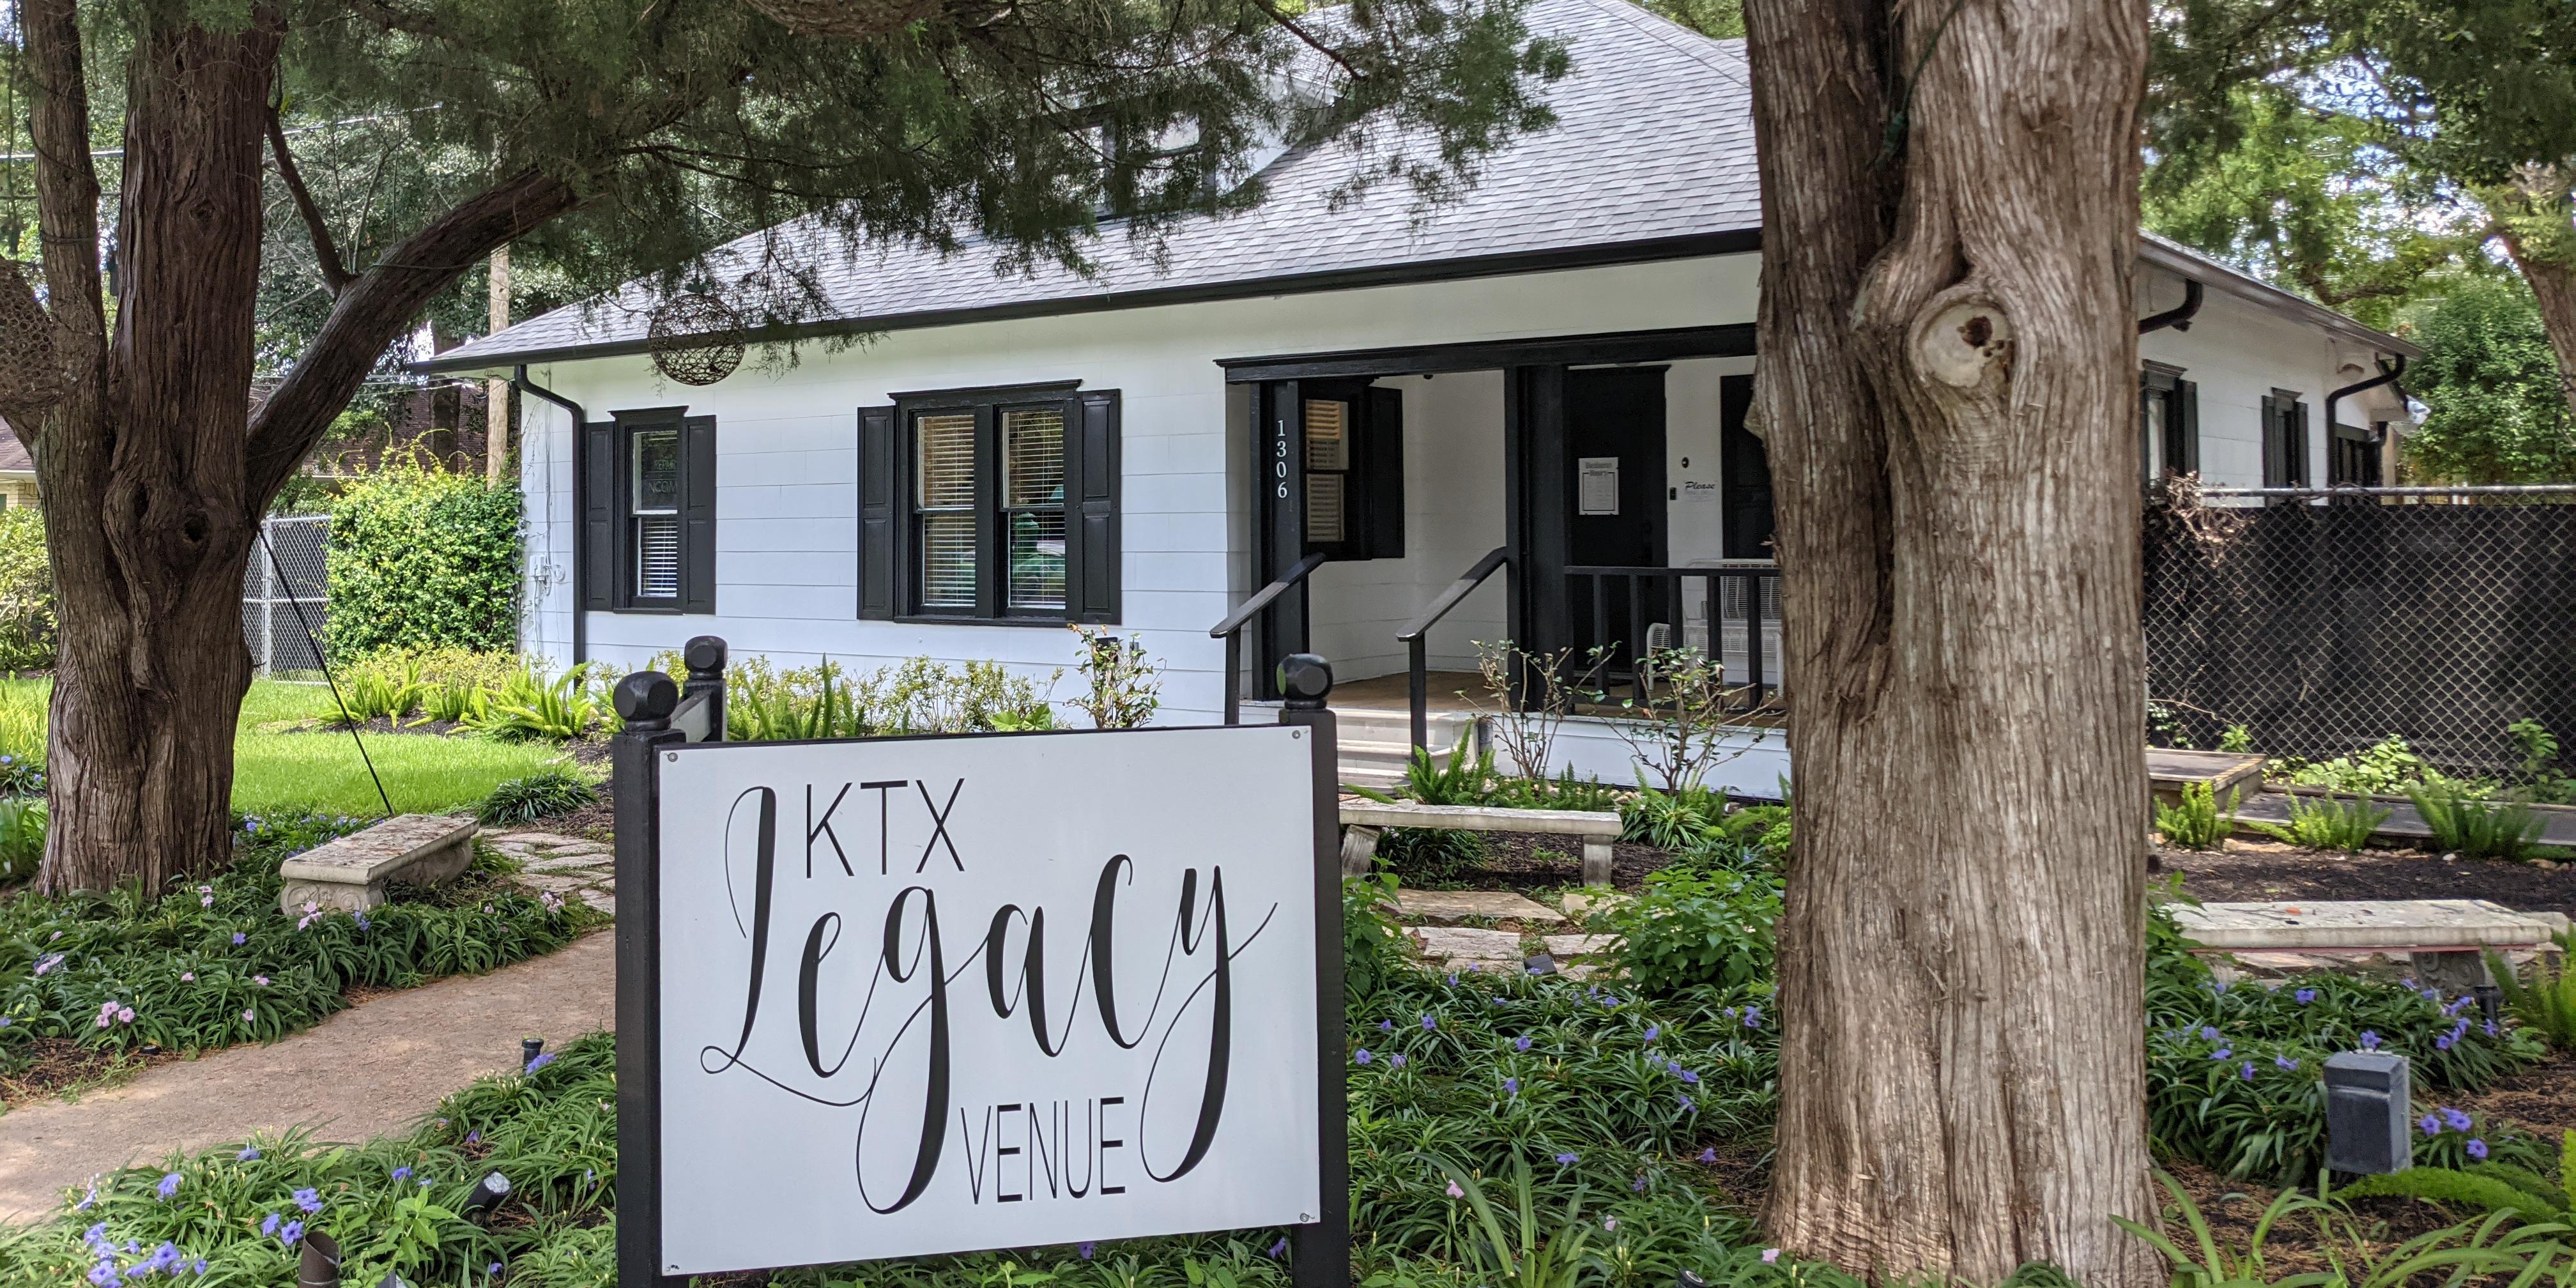 KTX Legacy Venue wedding Houston